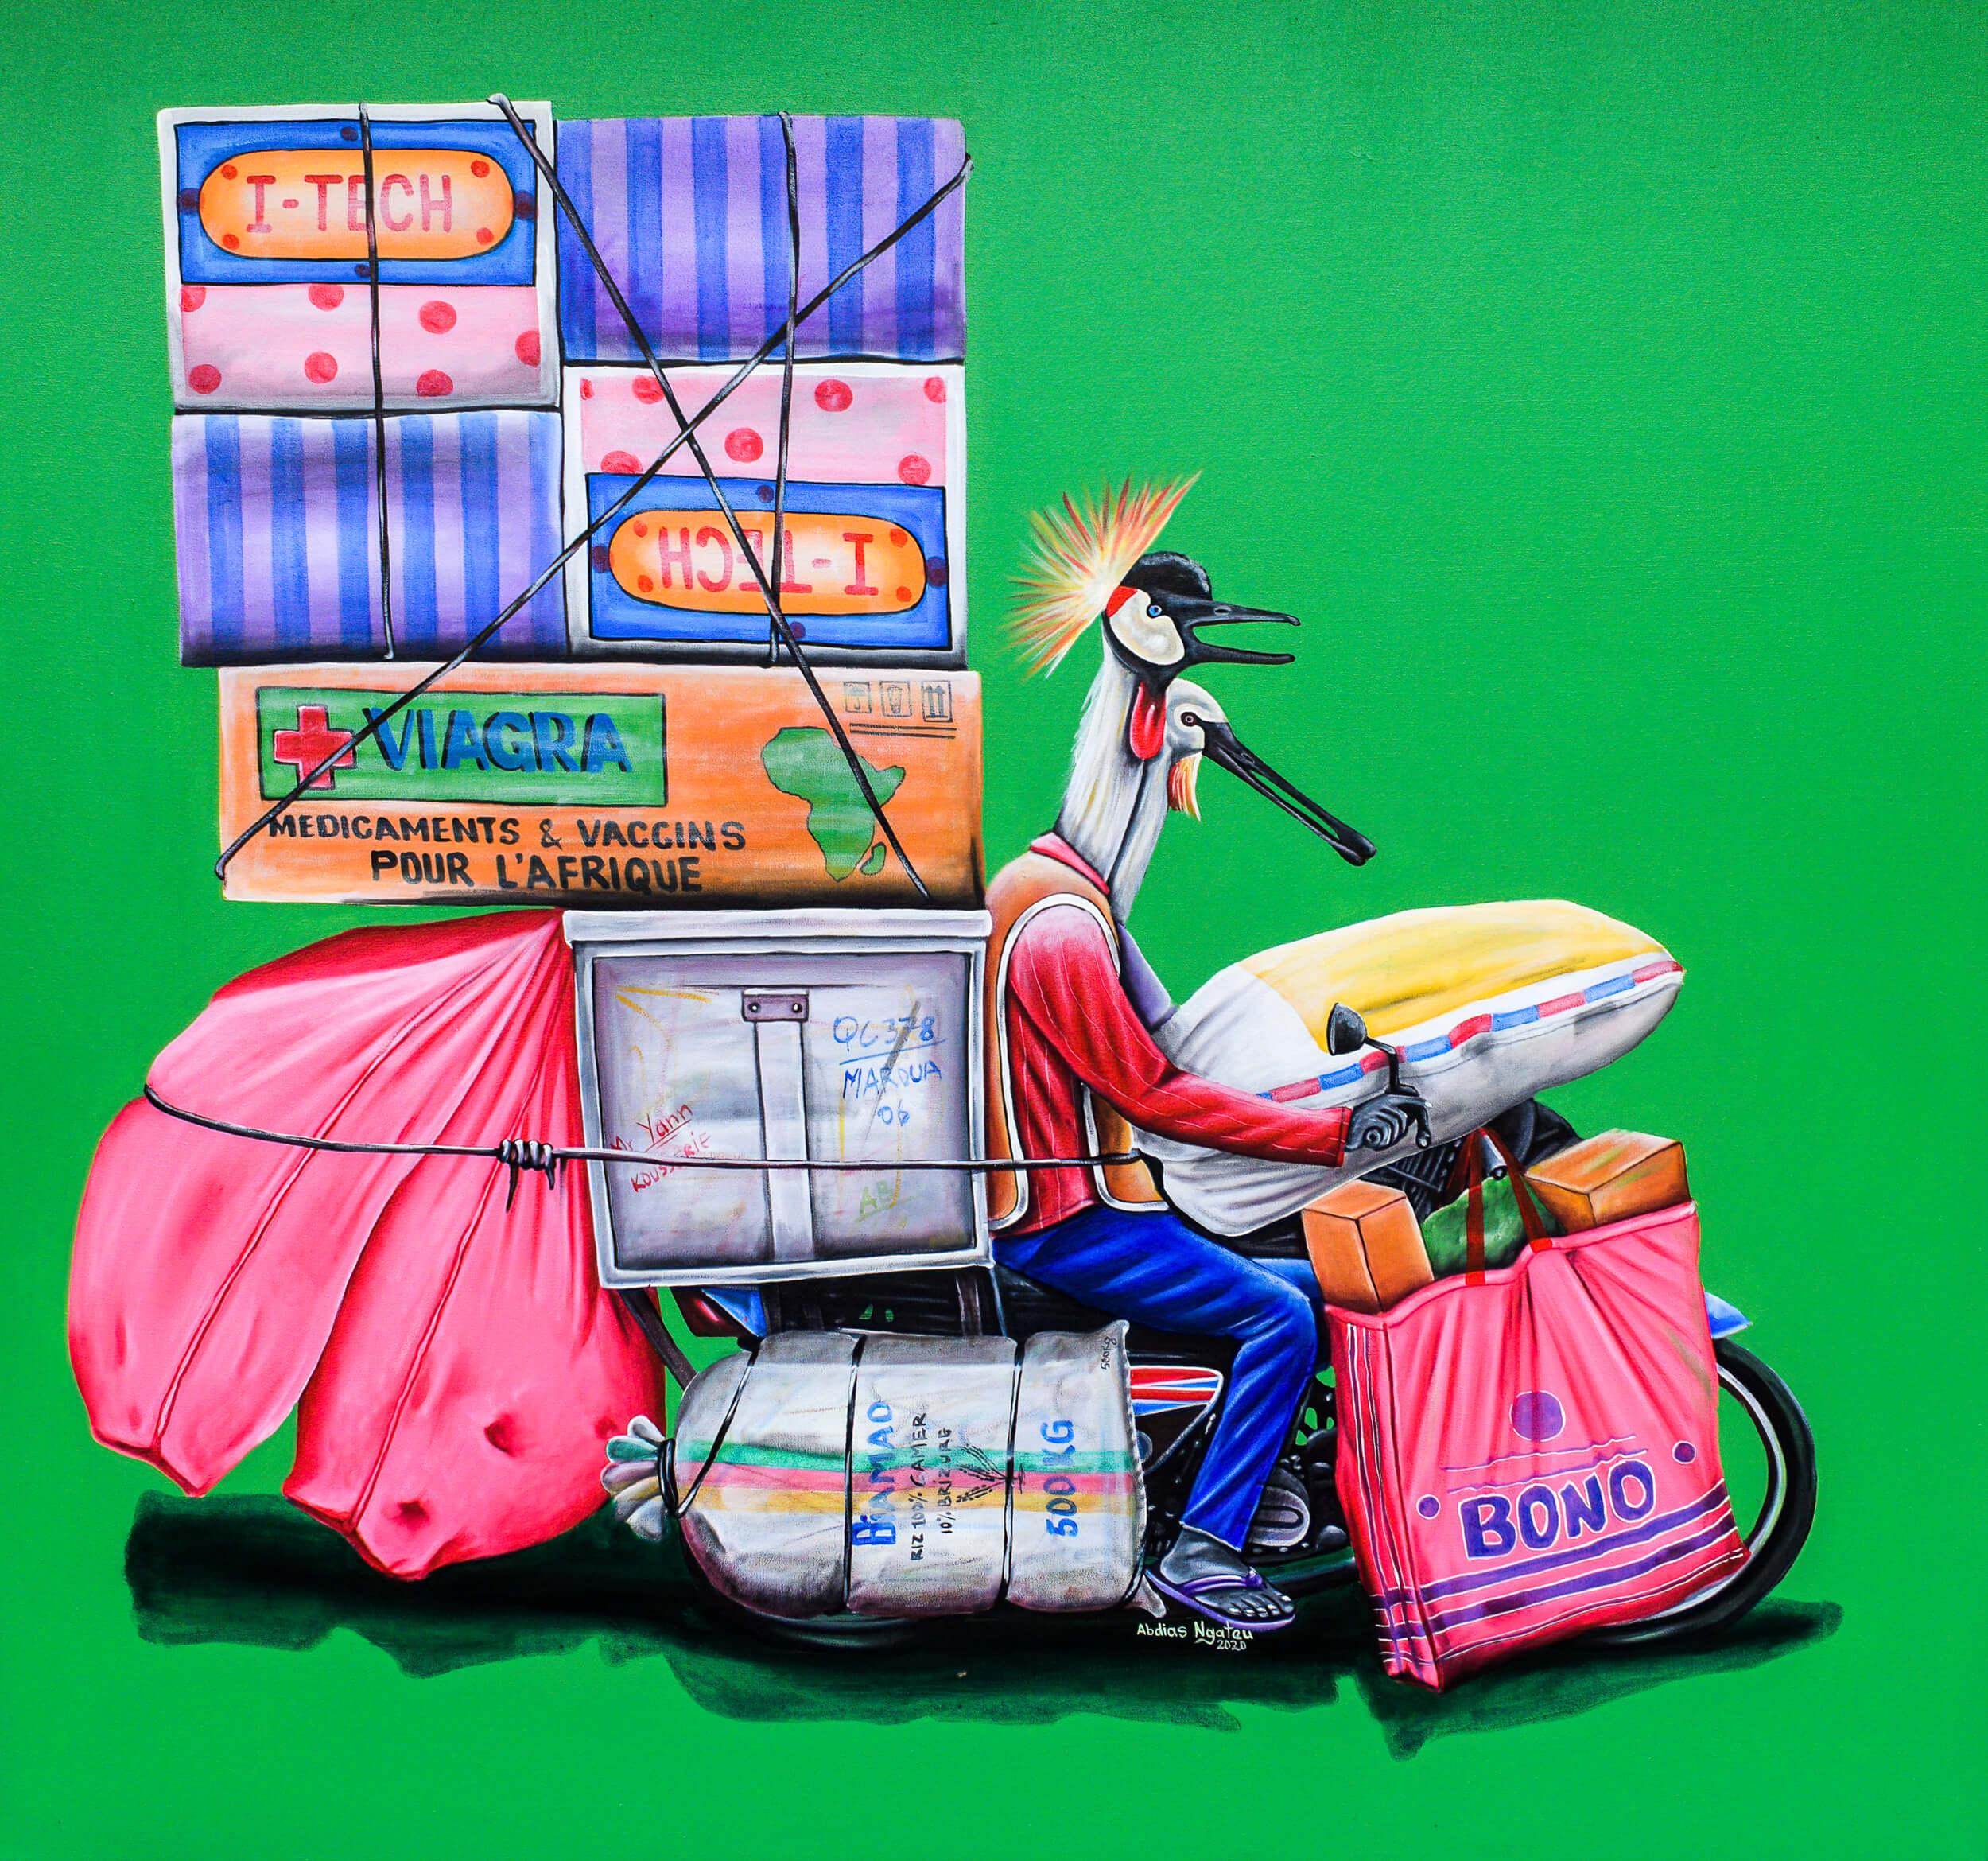 artsy-Abdias Ngateu - Le coursier 2 - 2021 - 120cm H x 130cm W - Acrylic on canvas - Courtesy by OOA Gallery-Modifier-2102